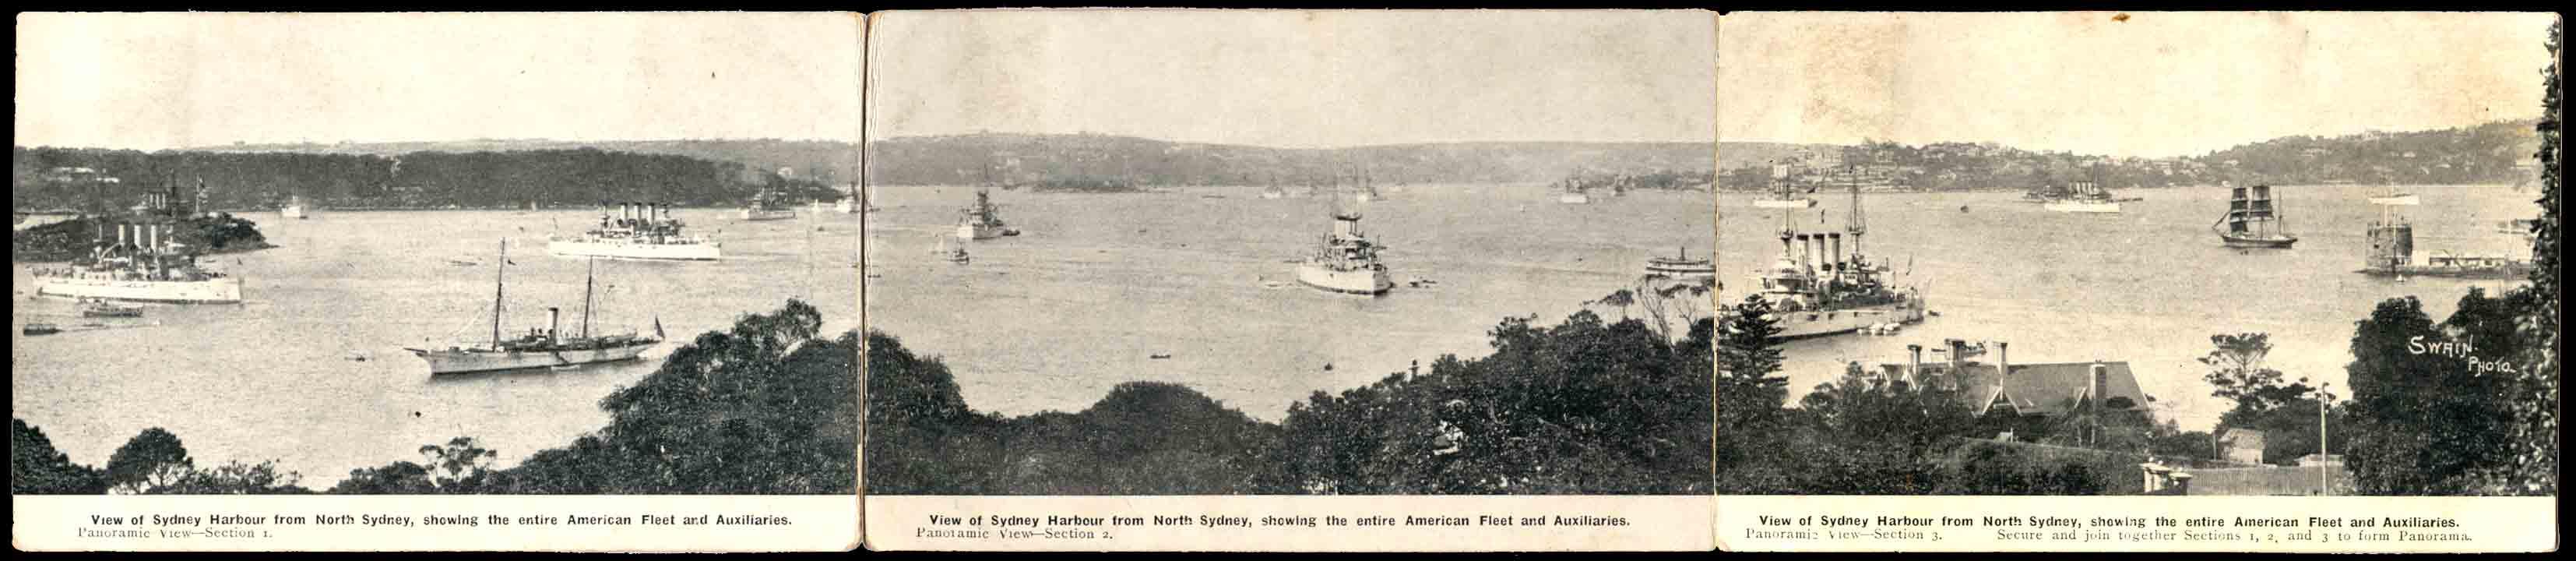 Sydney-Harbor-from-North-Sy